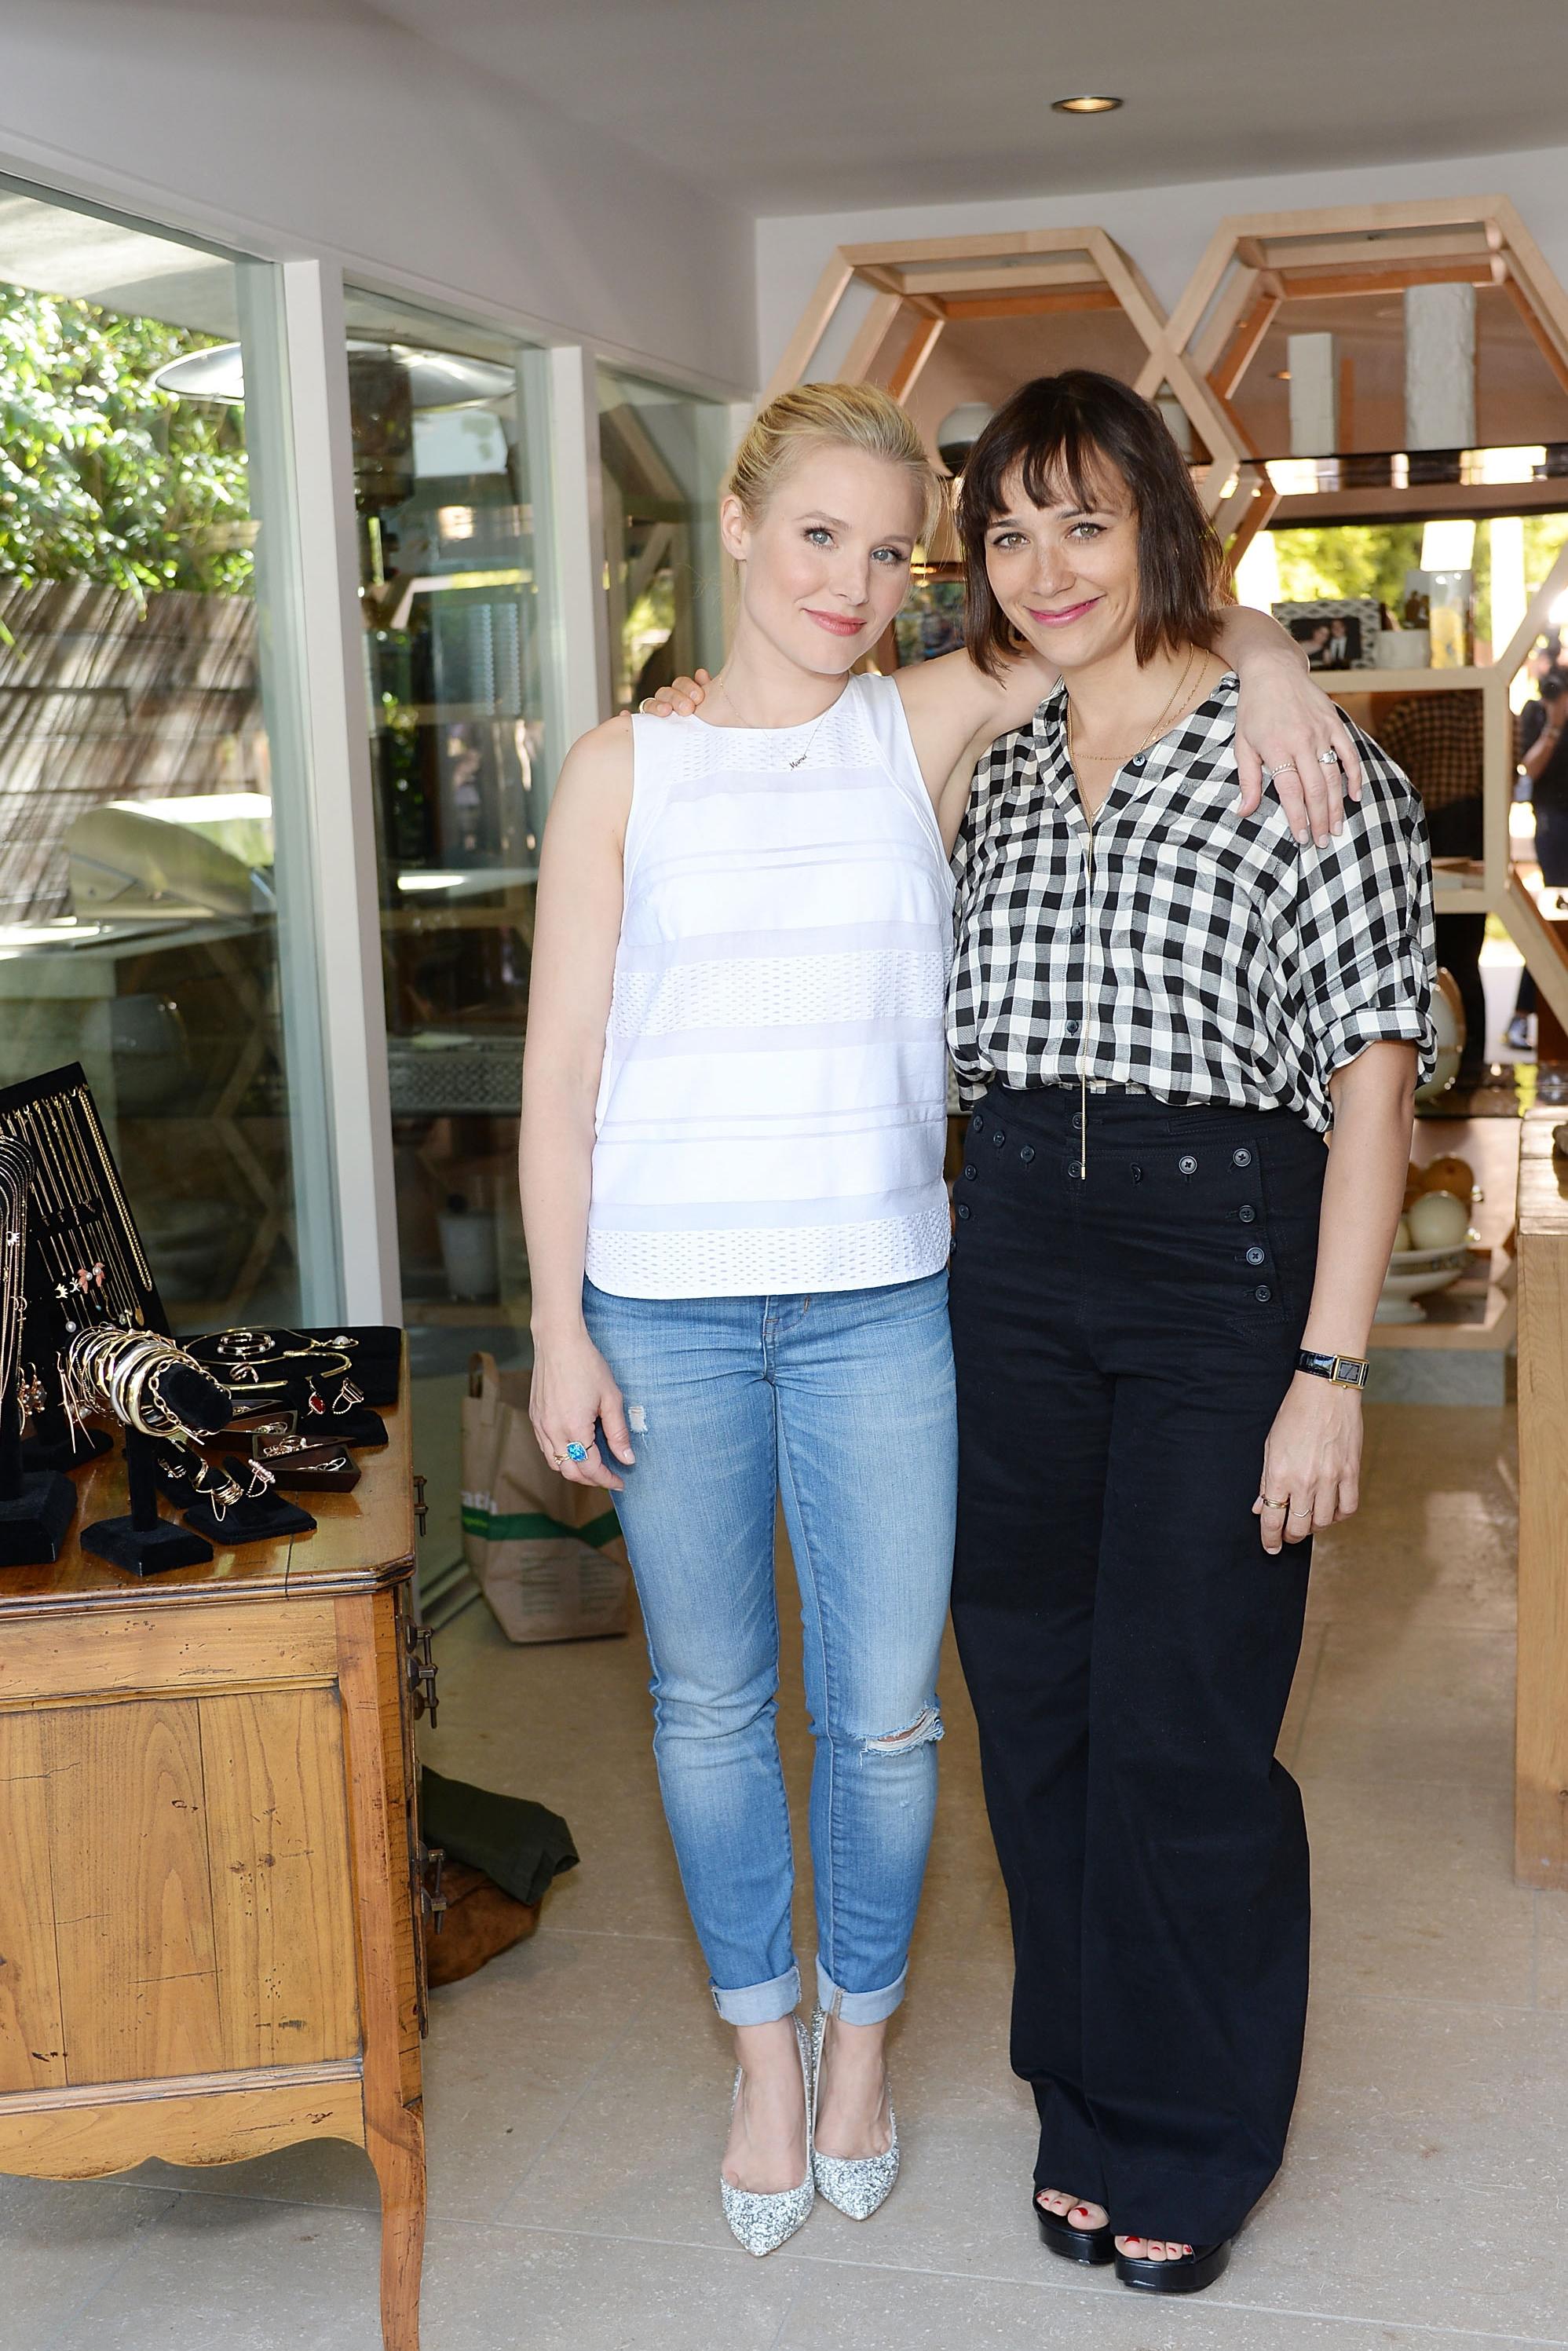 Kristen Bell and Rashida Jones Vince Camuto Ashlee Margolis party